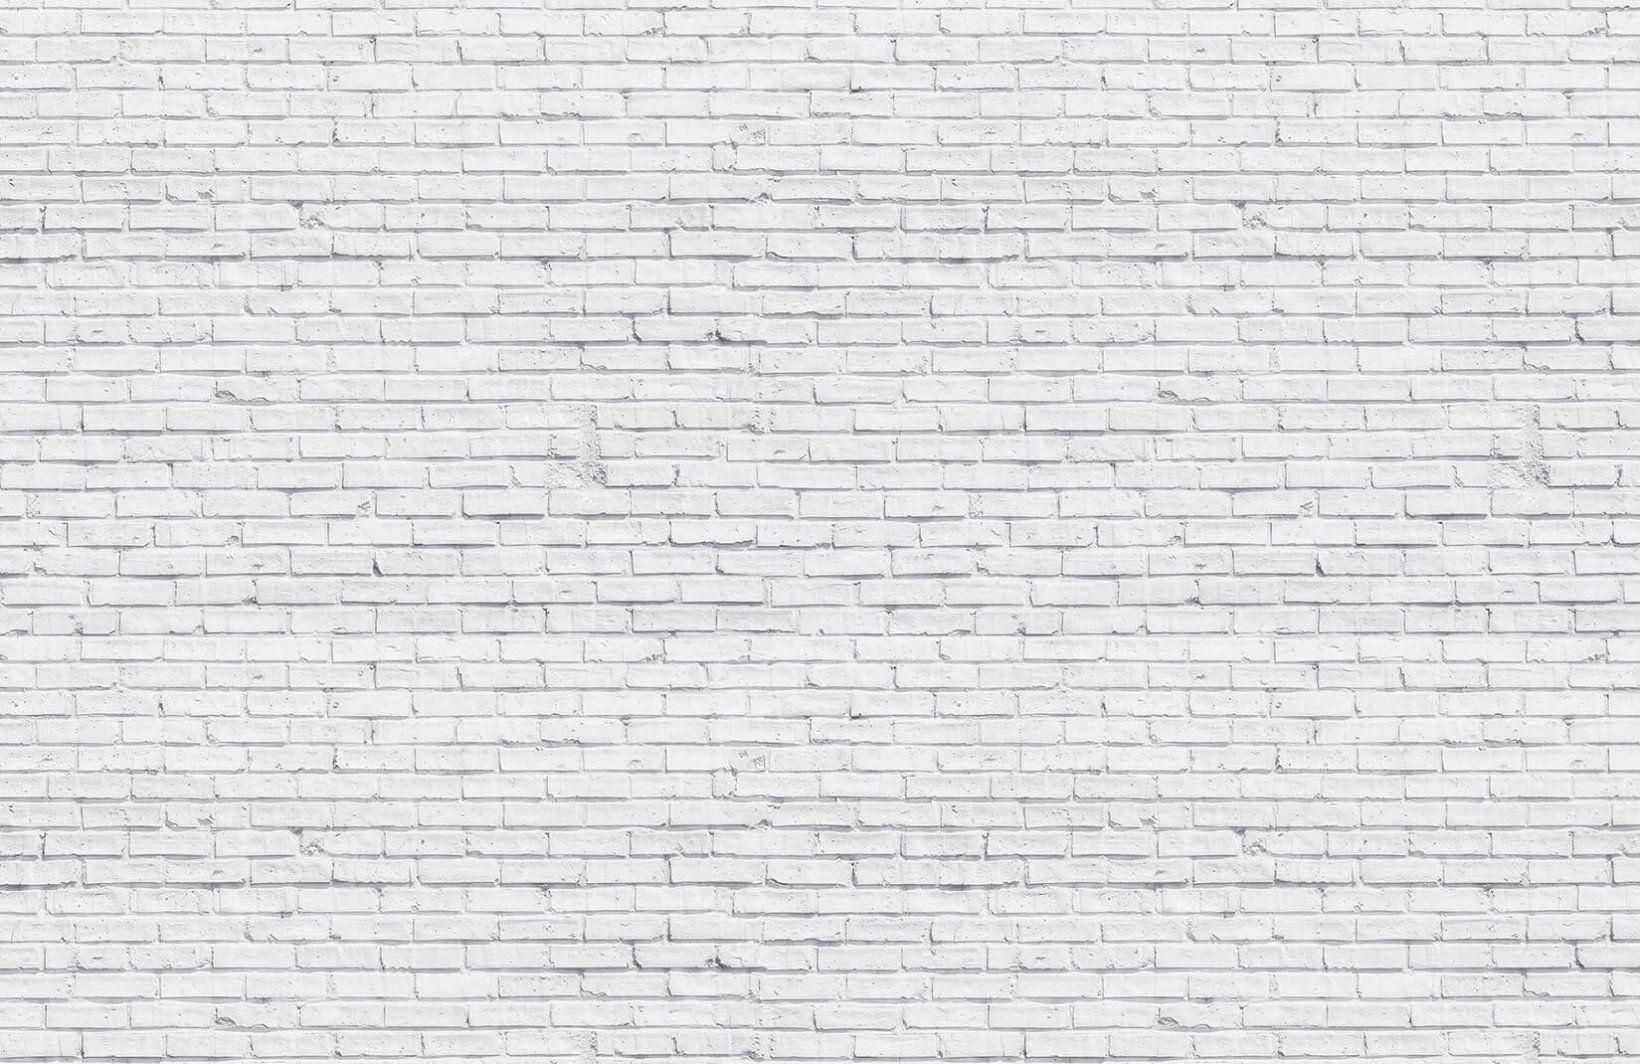 Clean White Brick Wallpaper Mural White Brick Wallpaper Brick Wallpaper Mural Brick Wallpaper